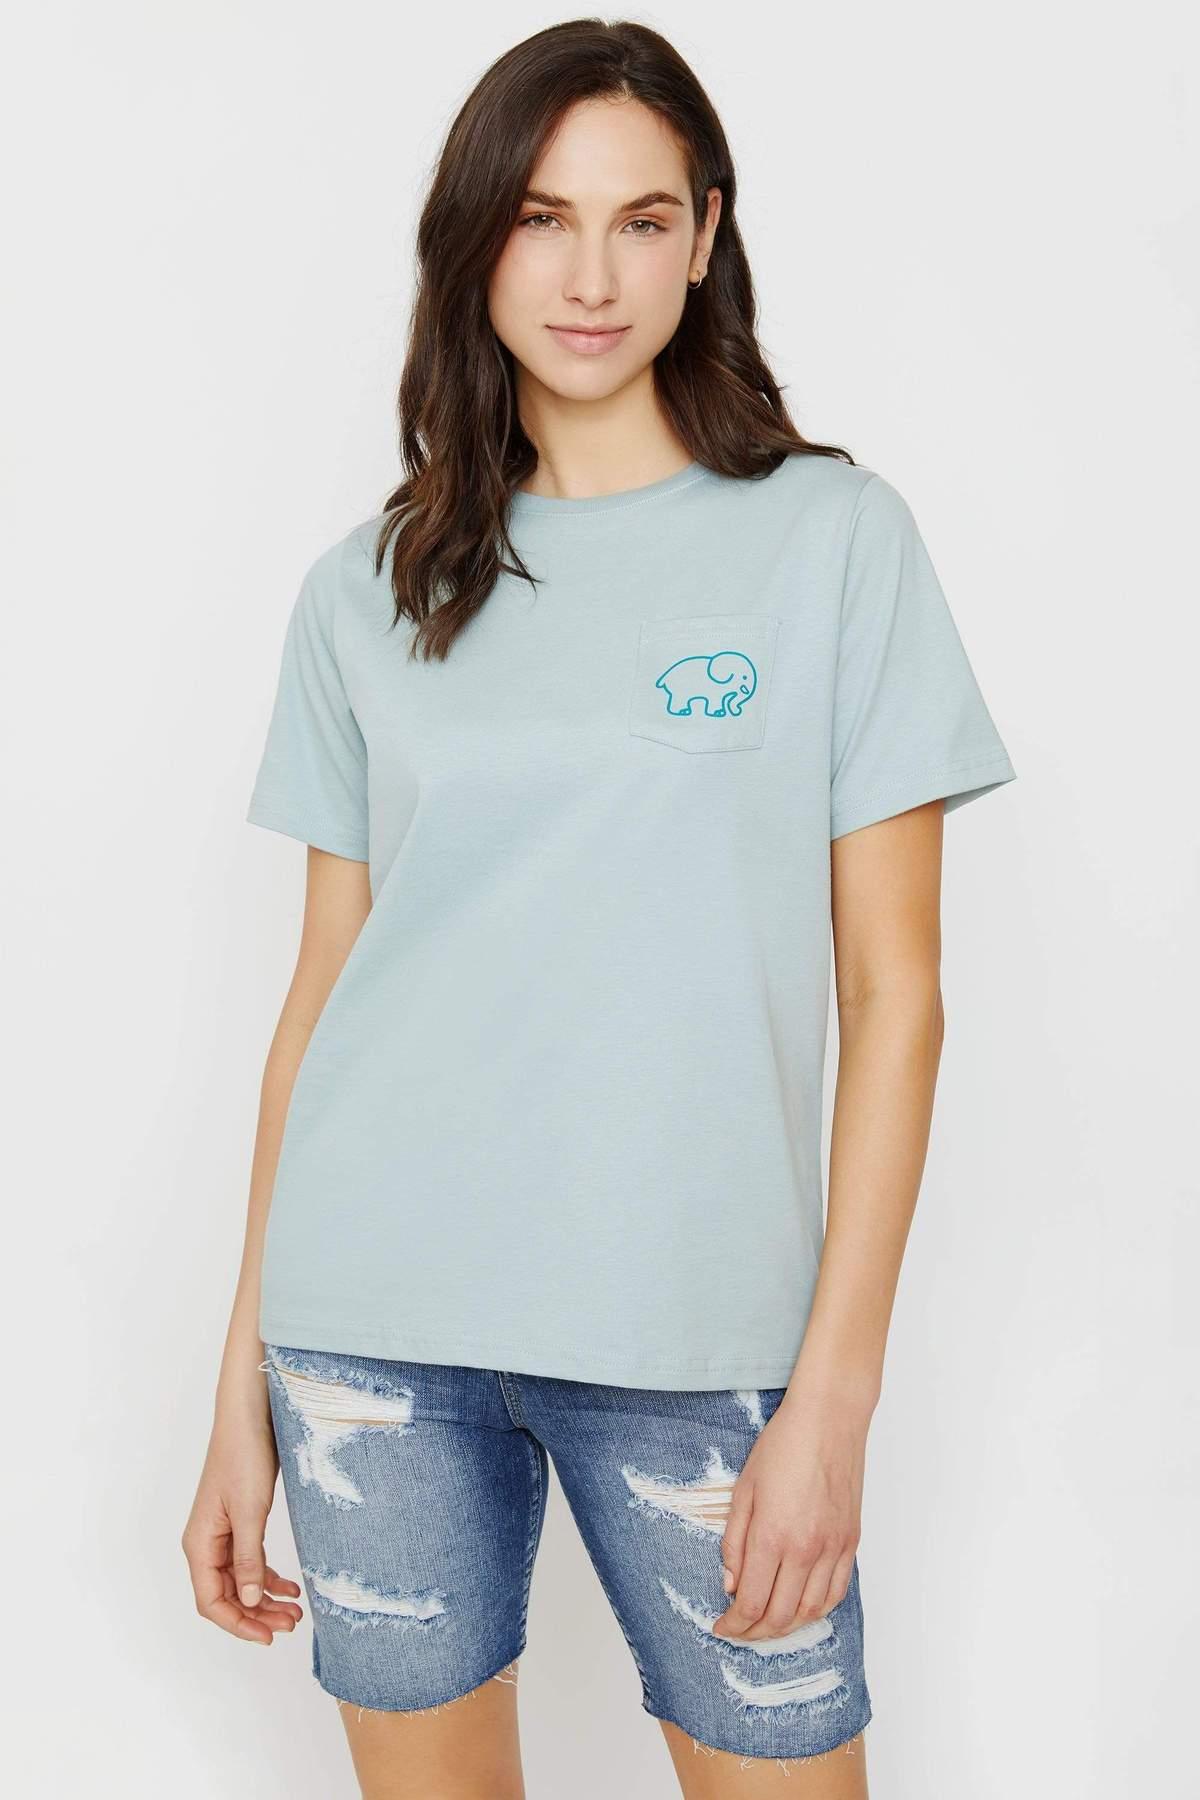 ivory-ella-women-s-short-sleeve-tees-xxs-ella-fit-pistachio-cat-coq-turtles-6633362358387_1200x.jpg